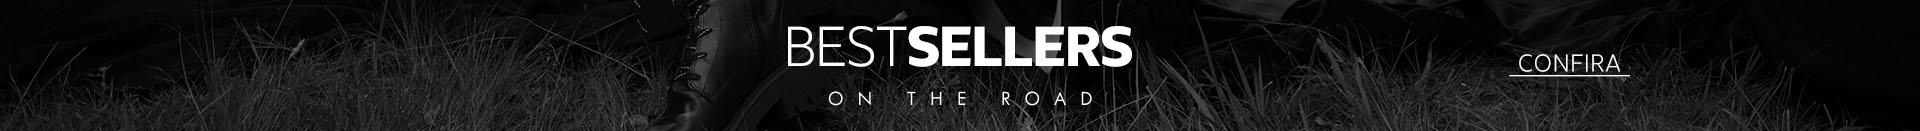 Banner-BestSellers-OnTheRoad-categoria-desktop-comcta.jpg